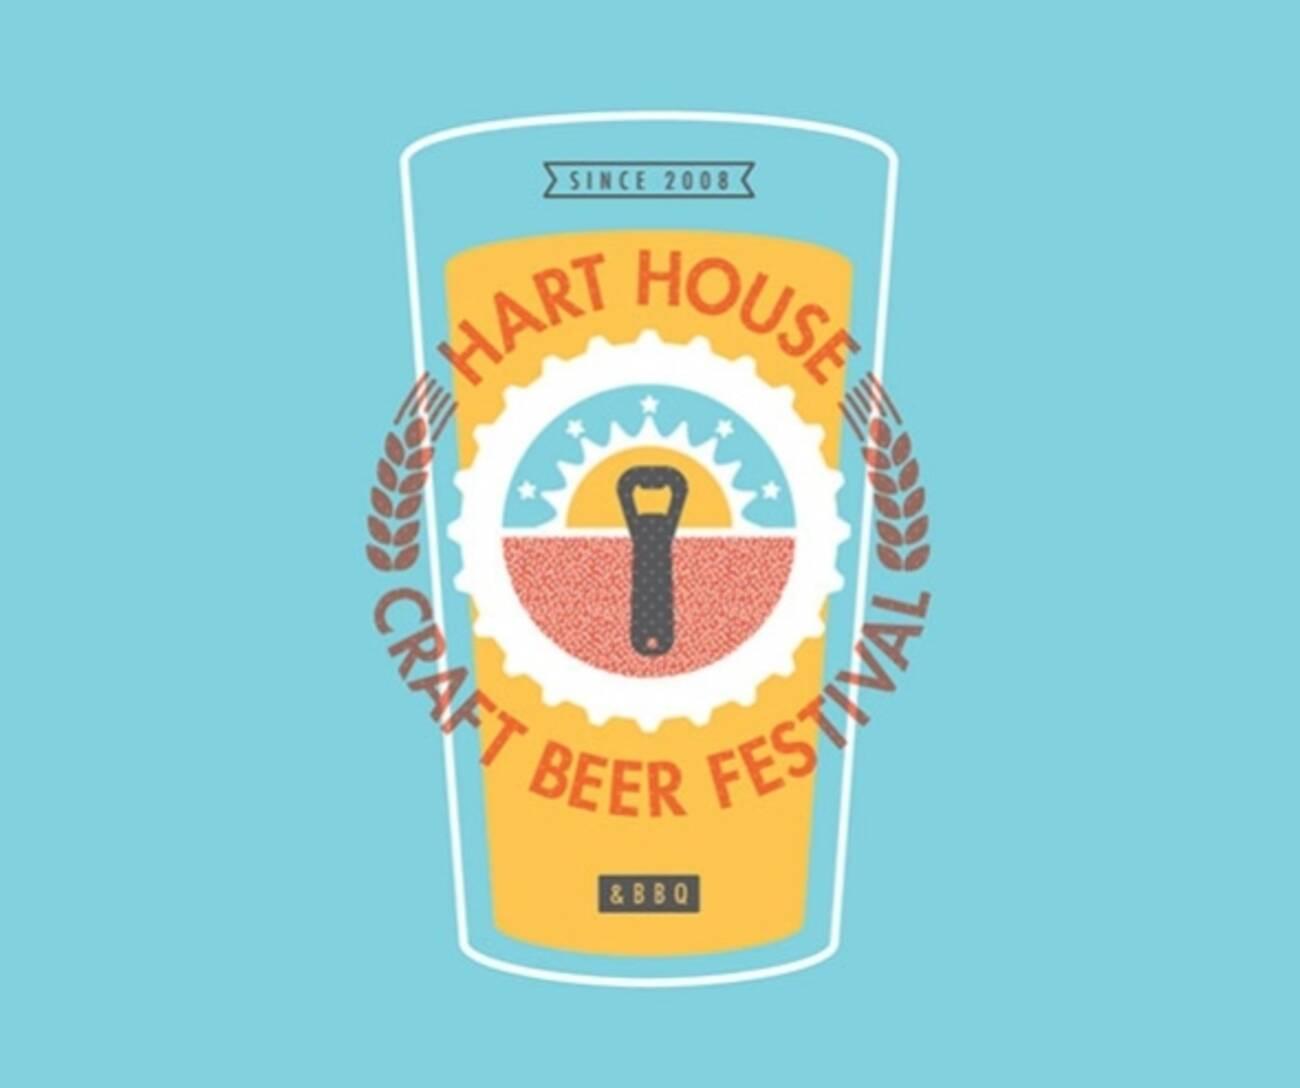 Hart House Craft Beer Festival